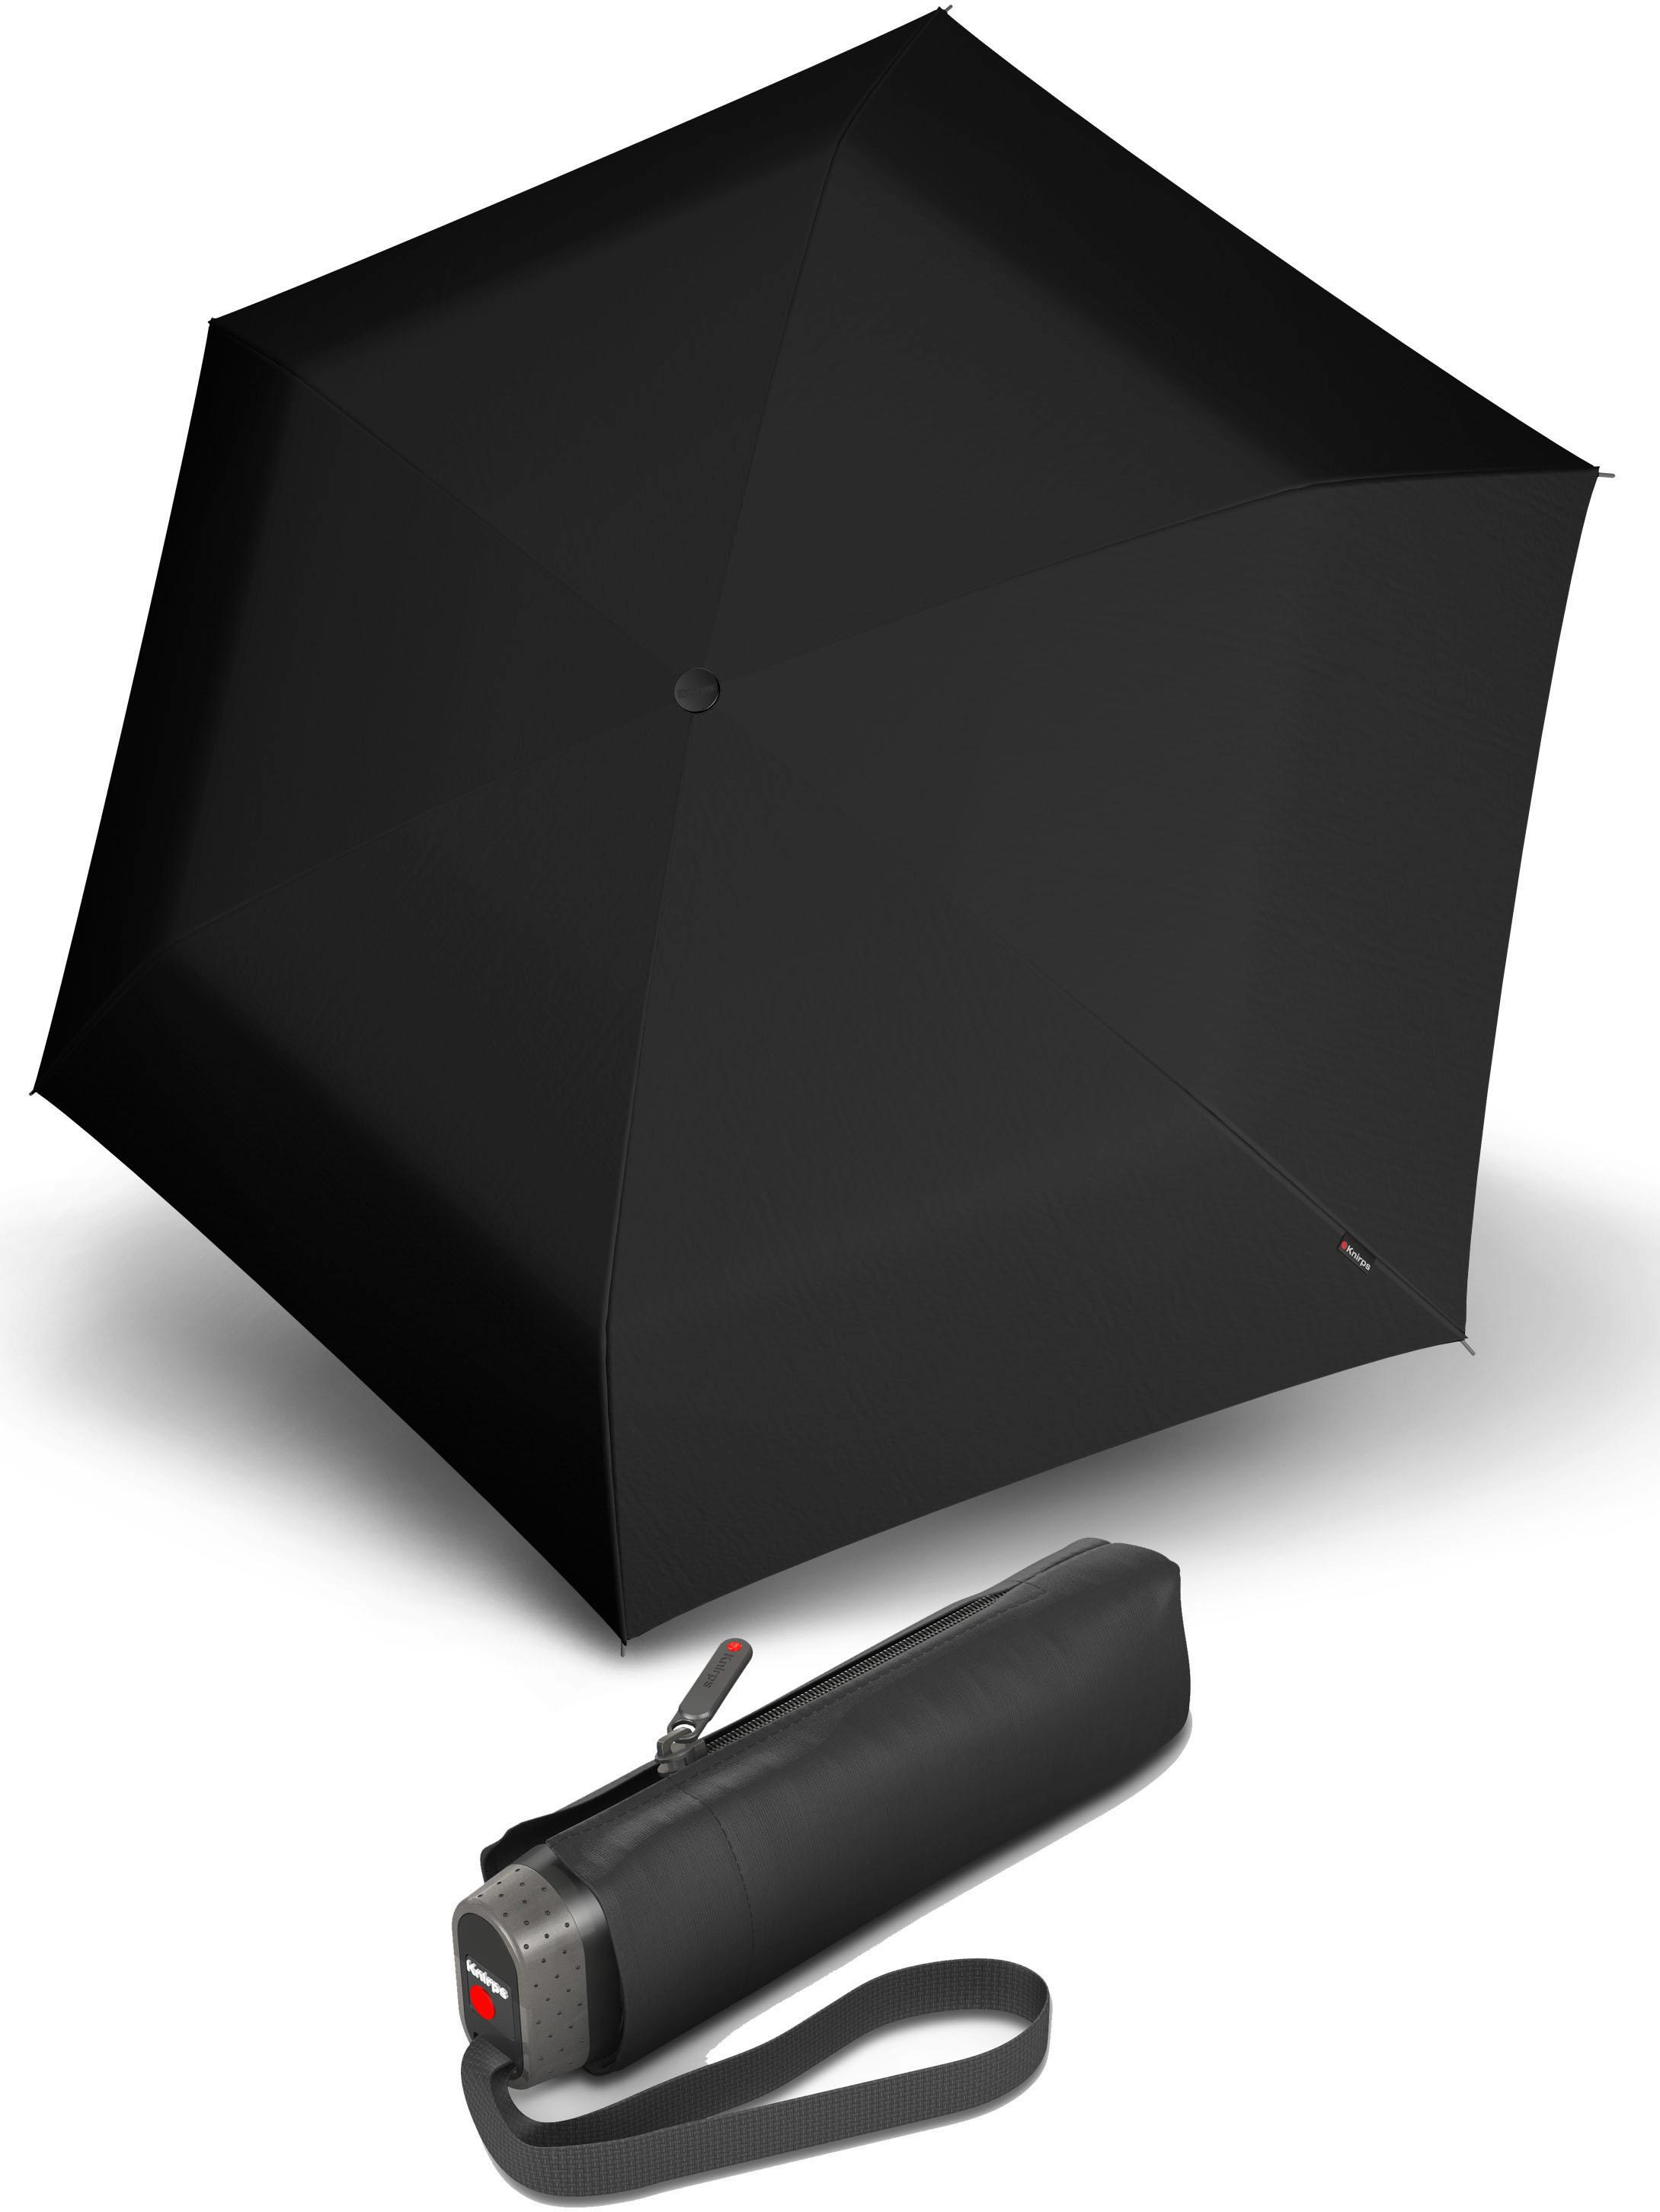 Knirps® Regenschirm - Taschenschirm, »TS.010 Slim Small Manual black« | Accessoires > Regenschirme | Schwarz | KNIRPS